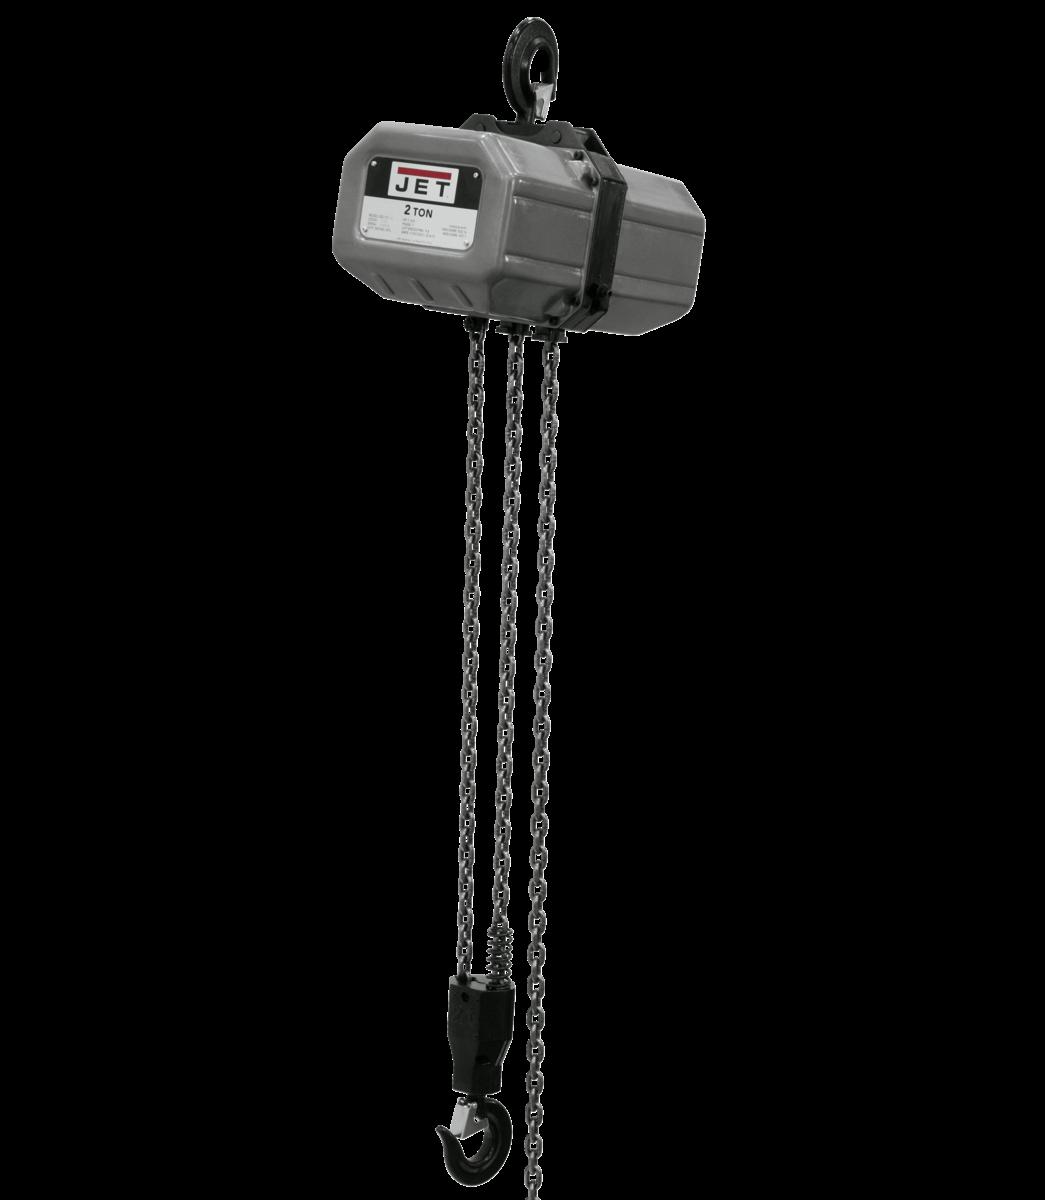 2SS-3C-10, 2-Ton Electric Chain Hoist 3-Phase 10' Lift